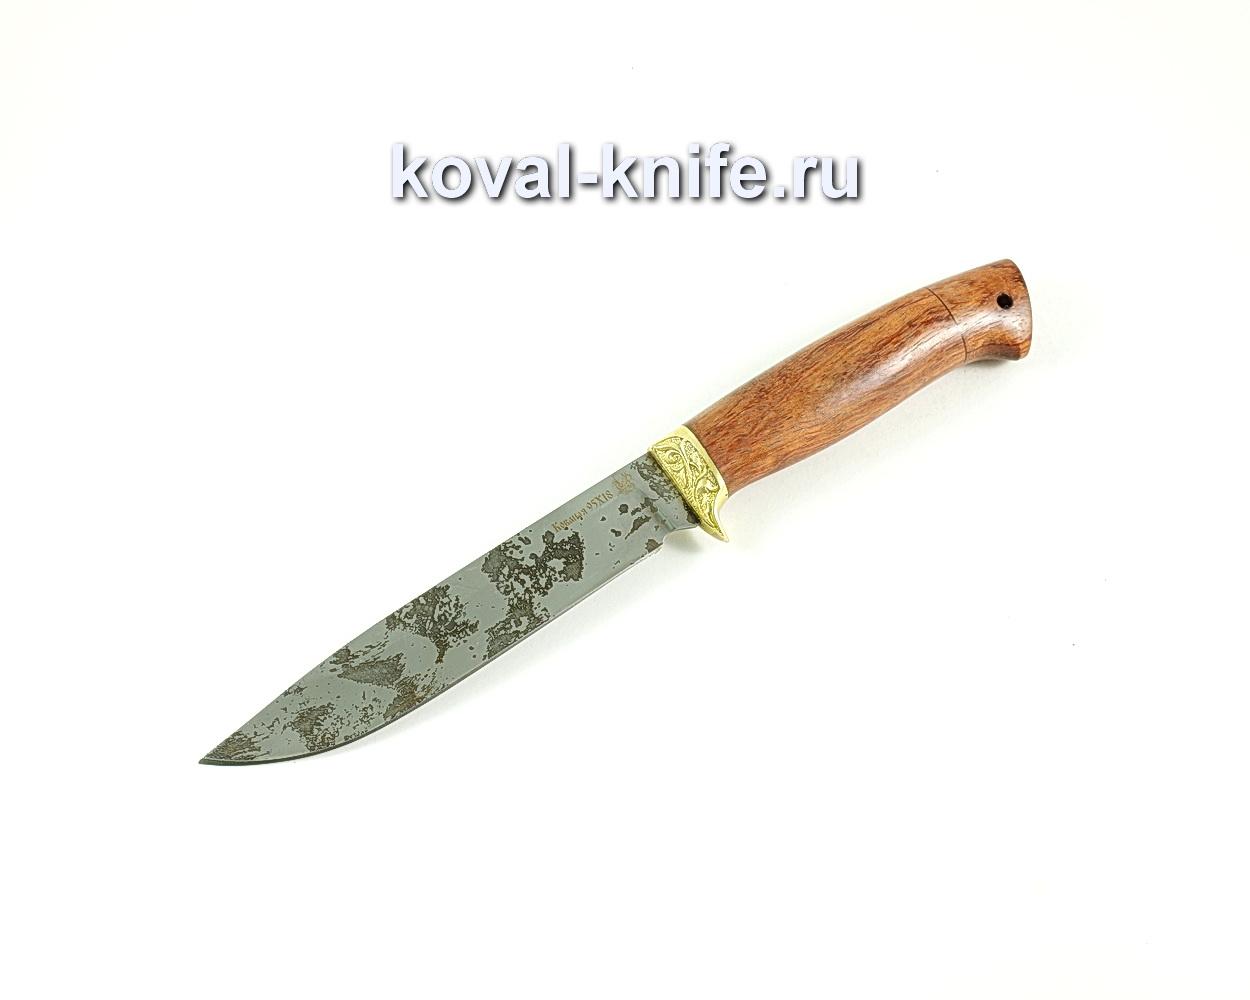 Нож Турист-3 (сталь 95х18), рукоять бубинга, литье A284